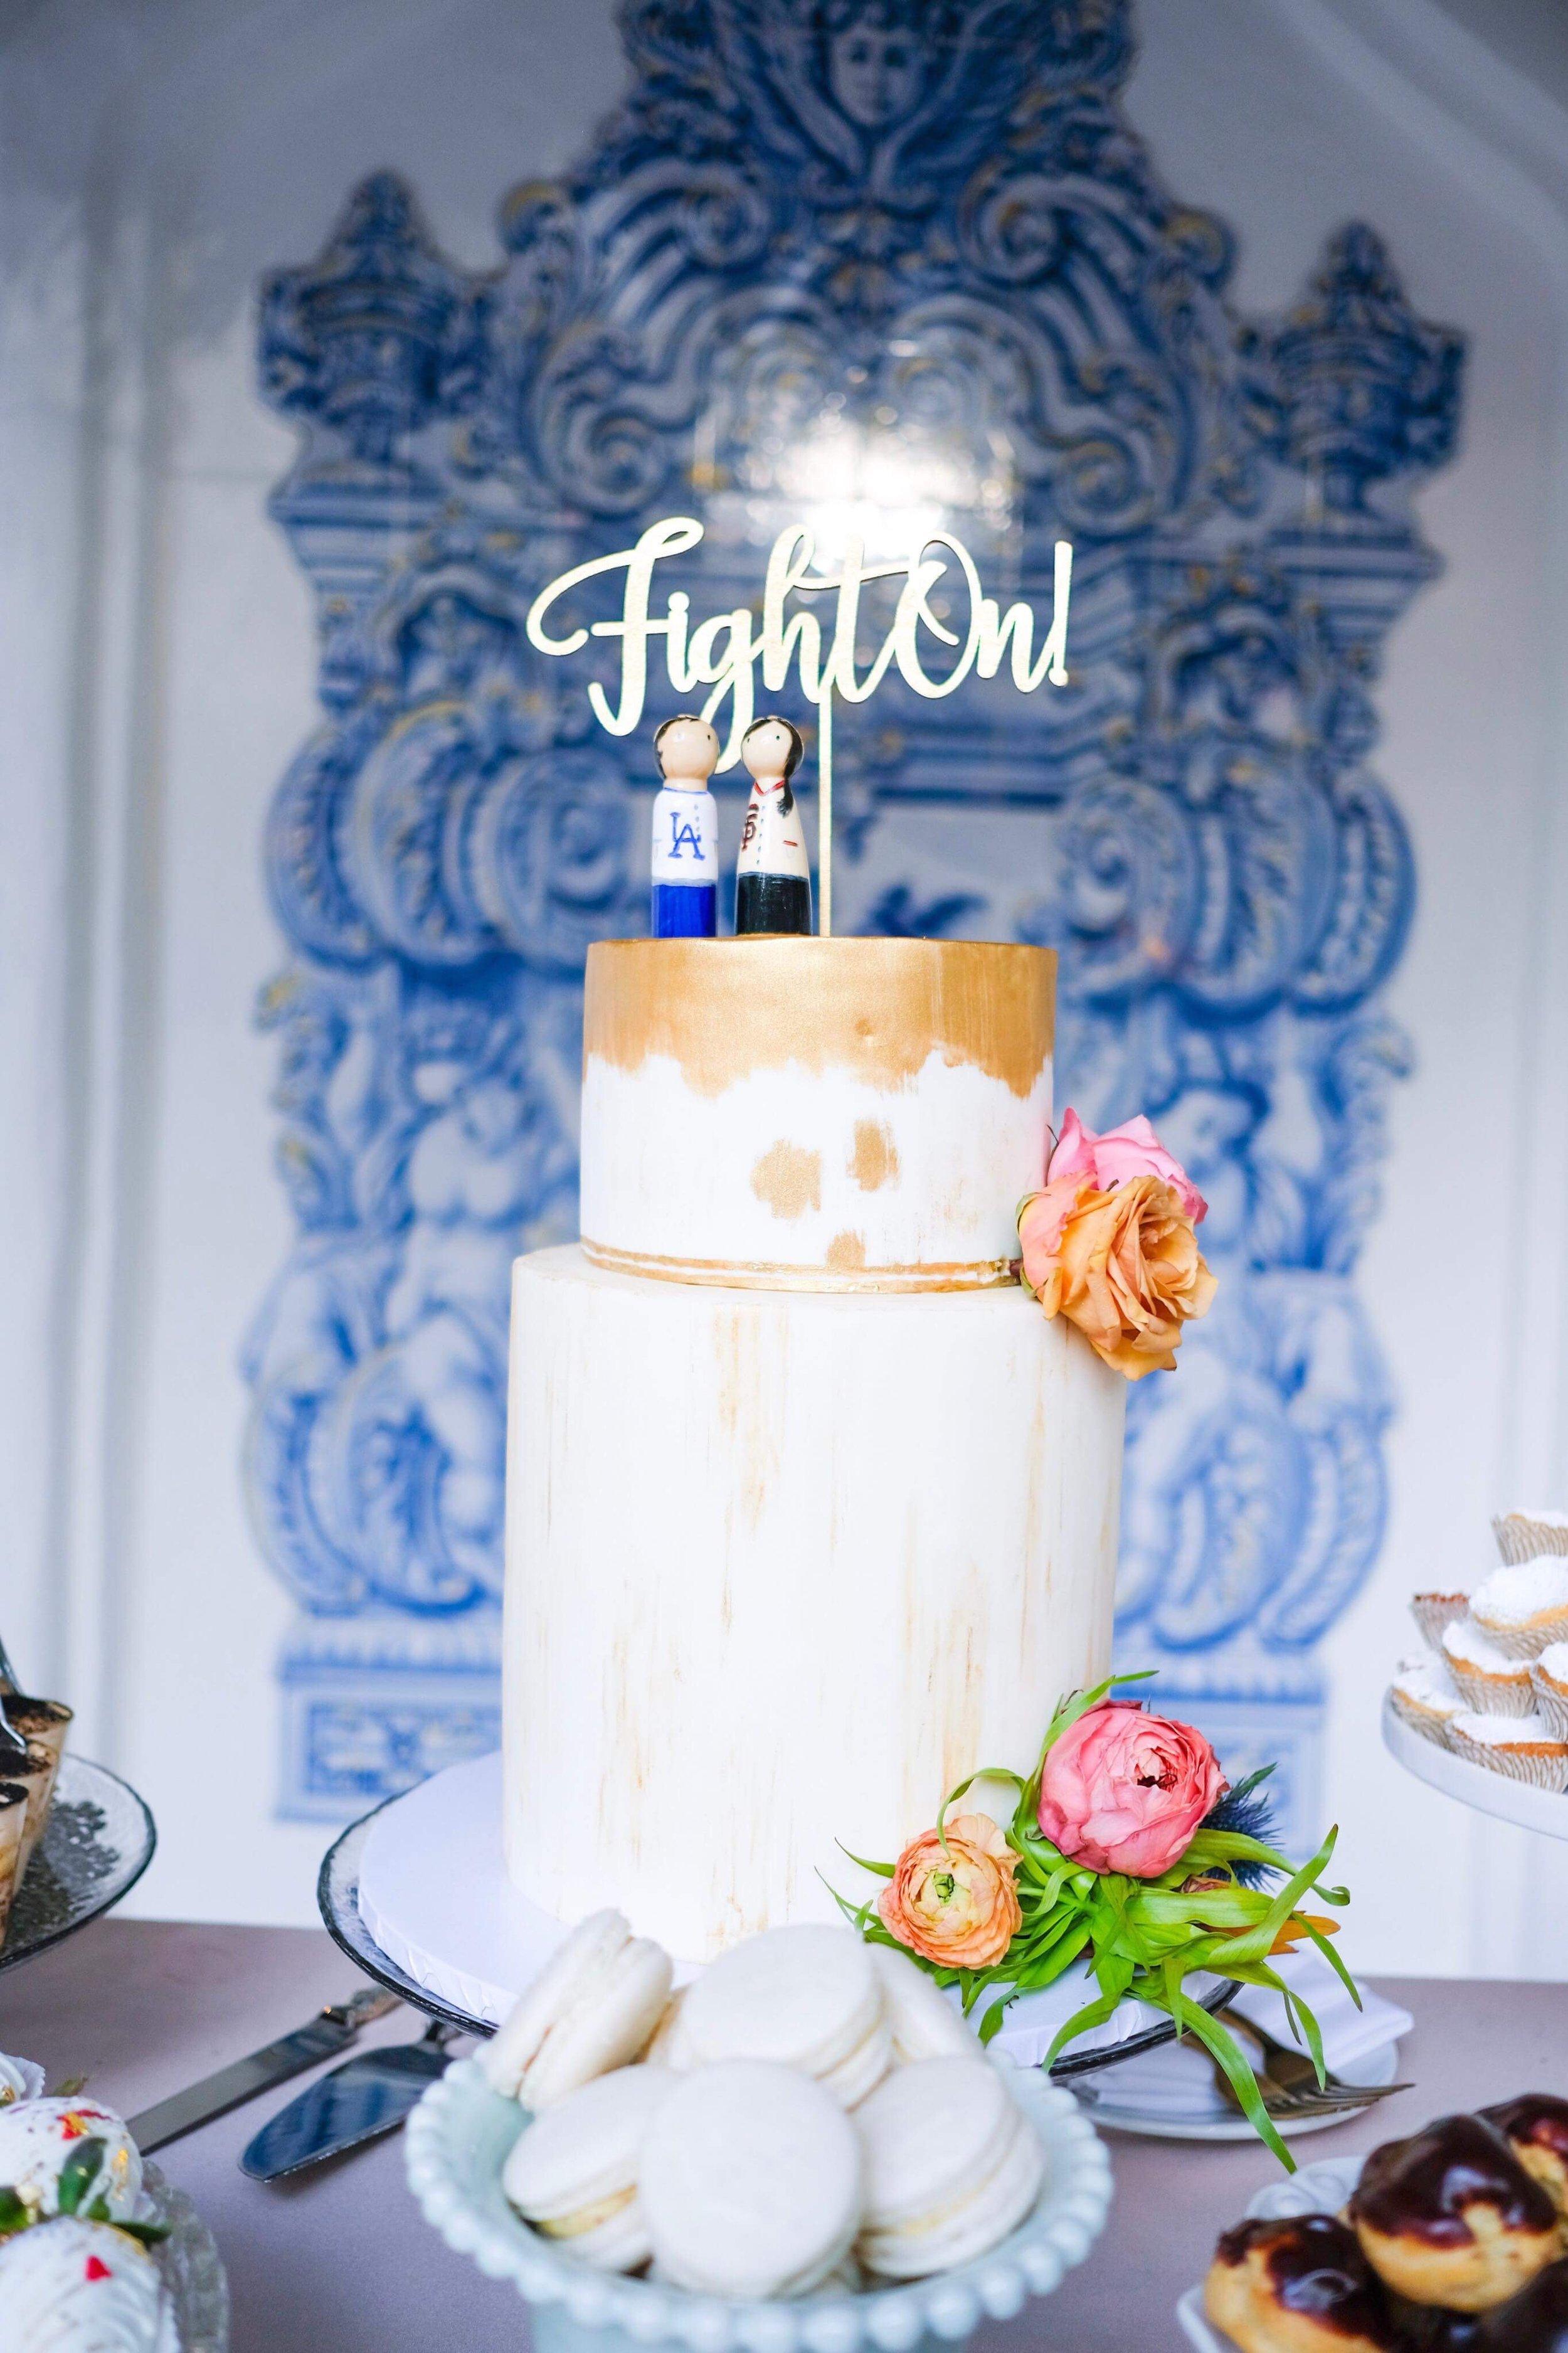 Gold fondant Fight On USC wedding cake, Rancho Las Lomas